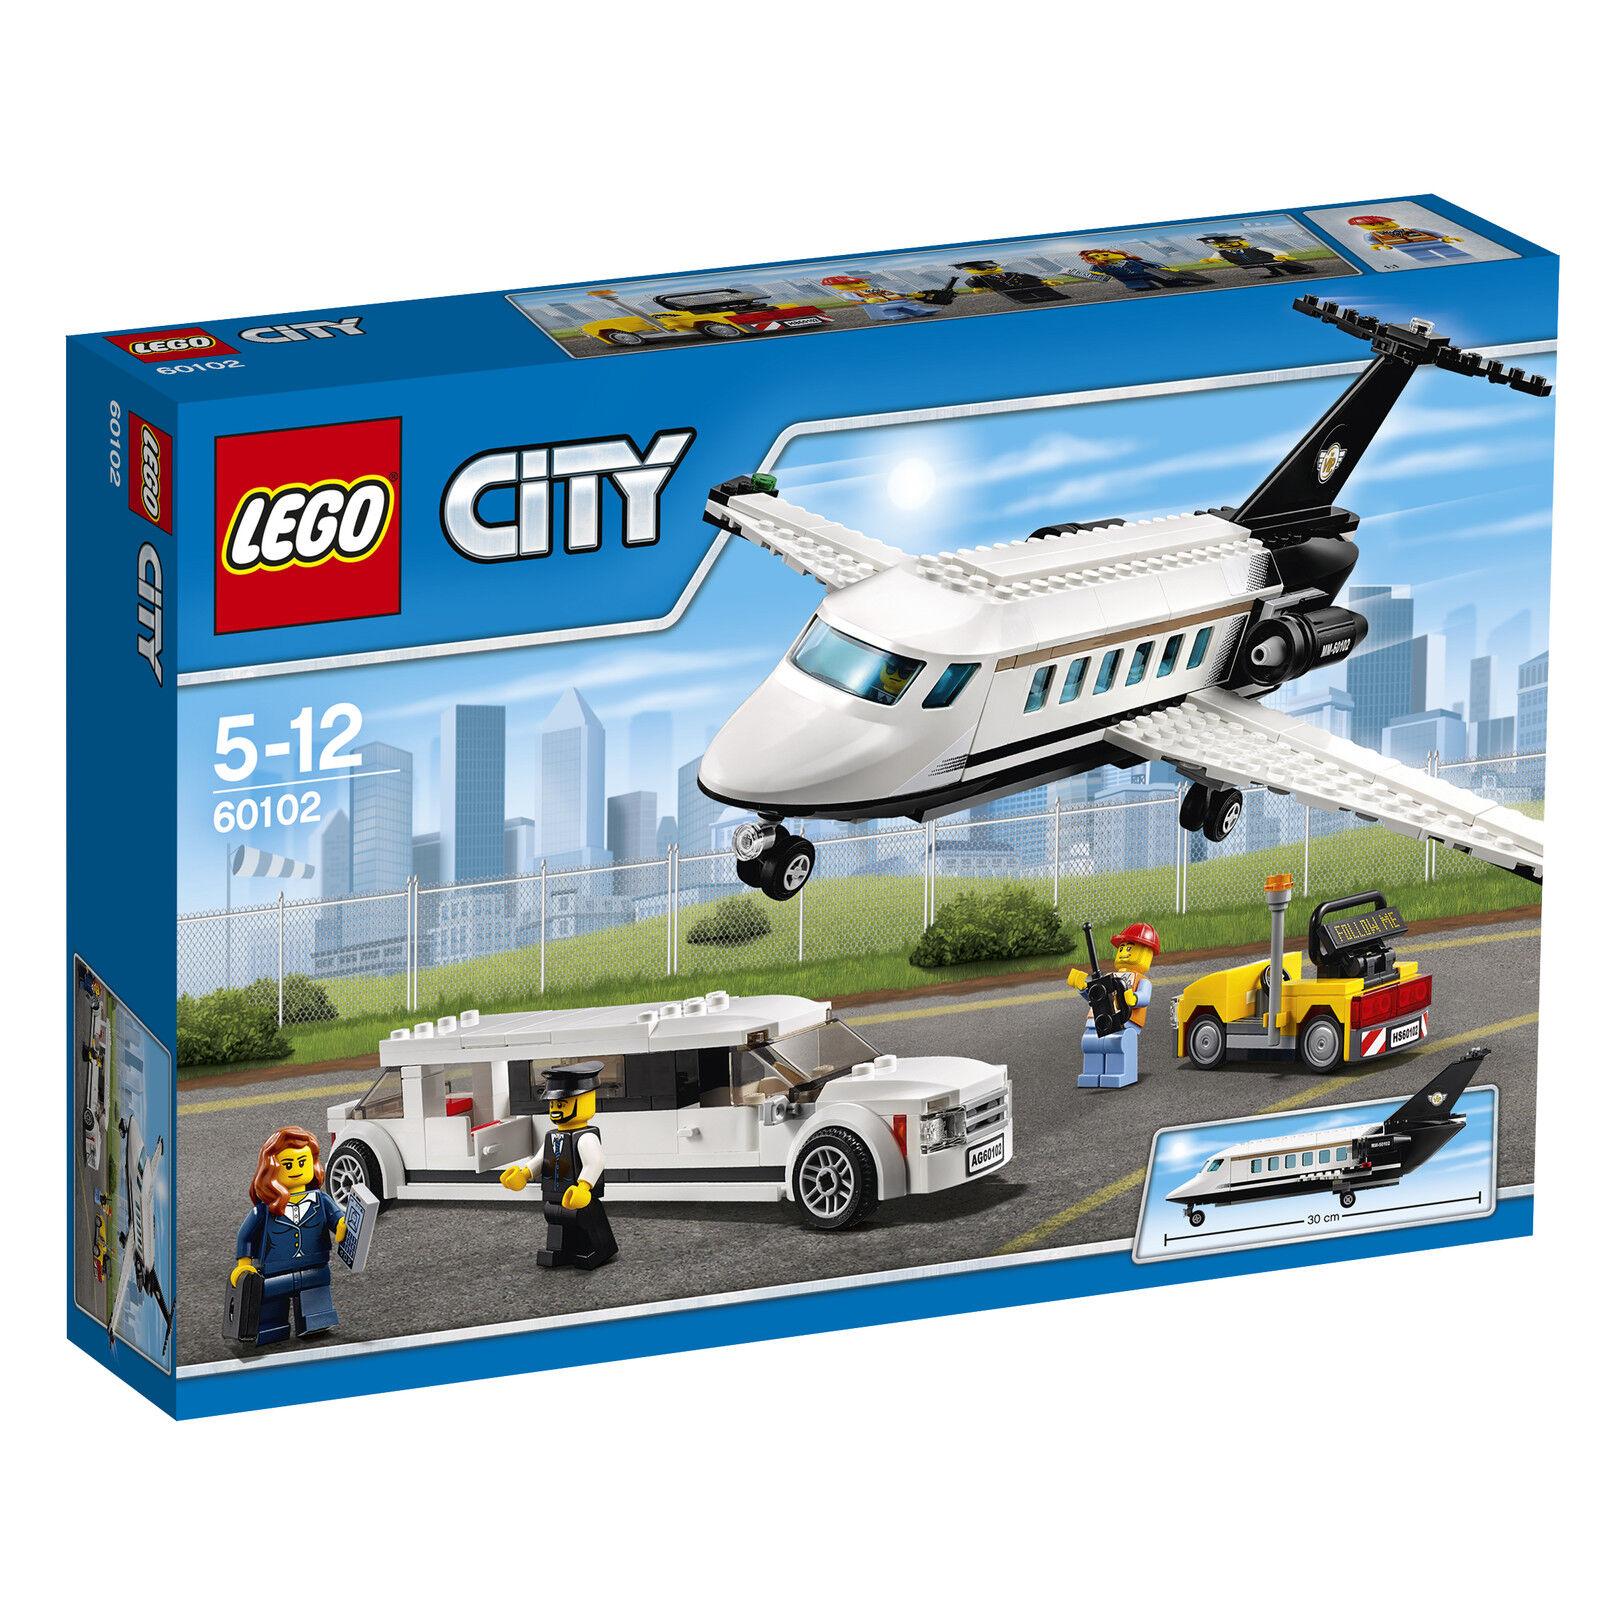 LEGO ® City 60102 Aeroporto VIP-Service NUOVO OVP _ Airport VIP Service NEW MISB NRFB